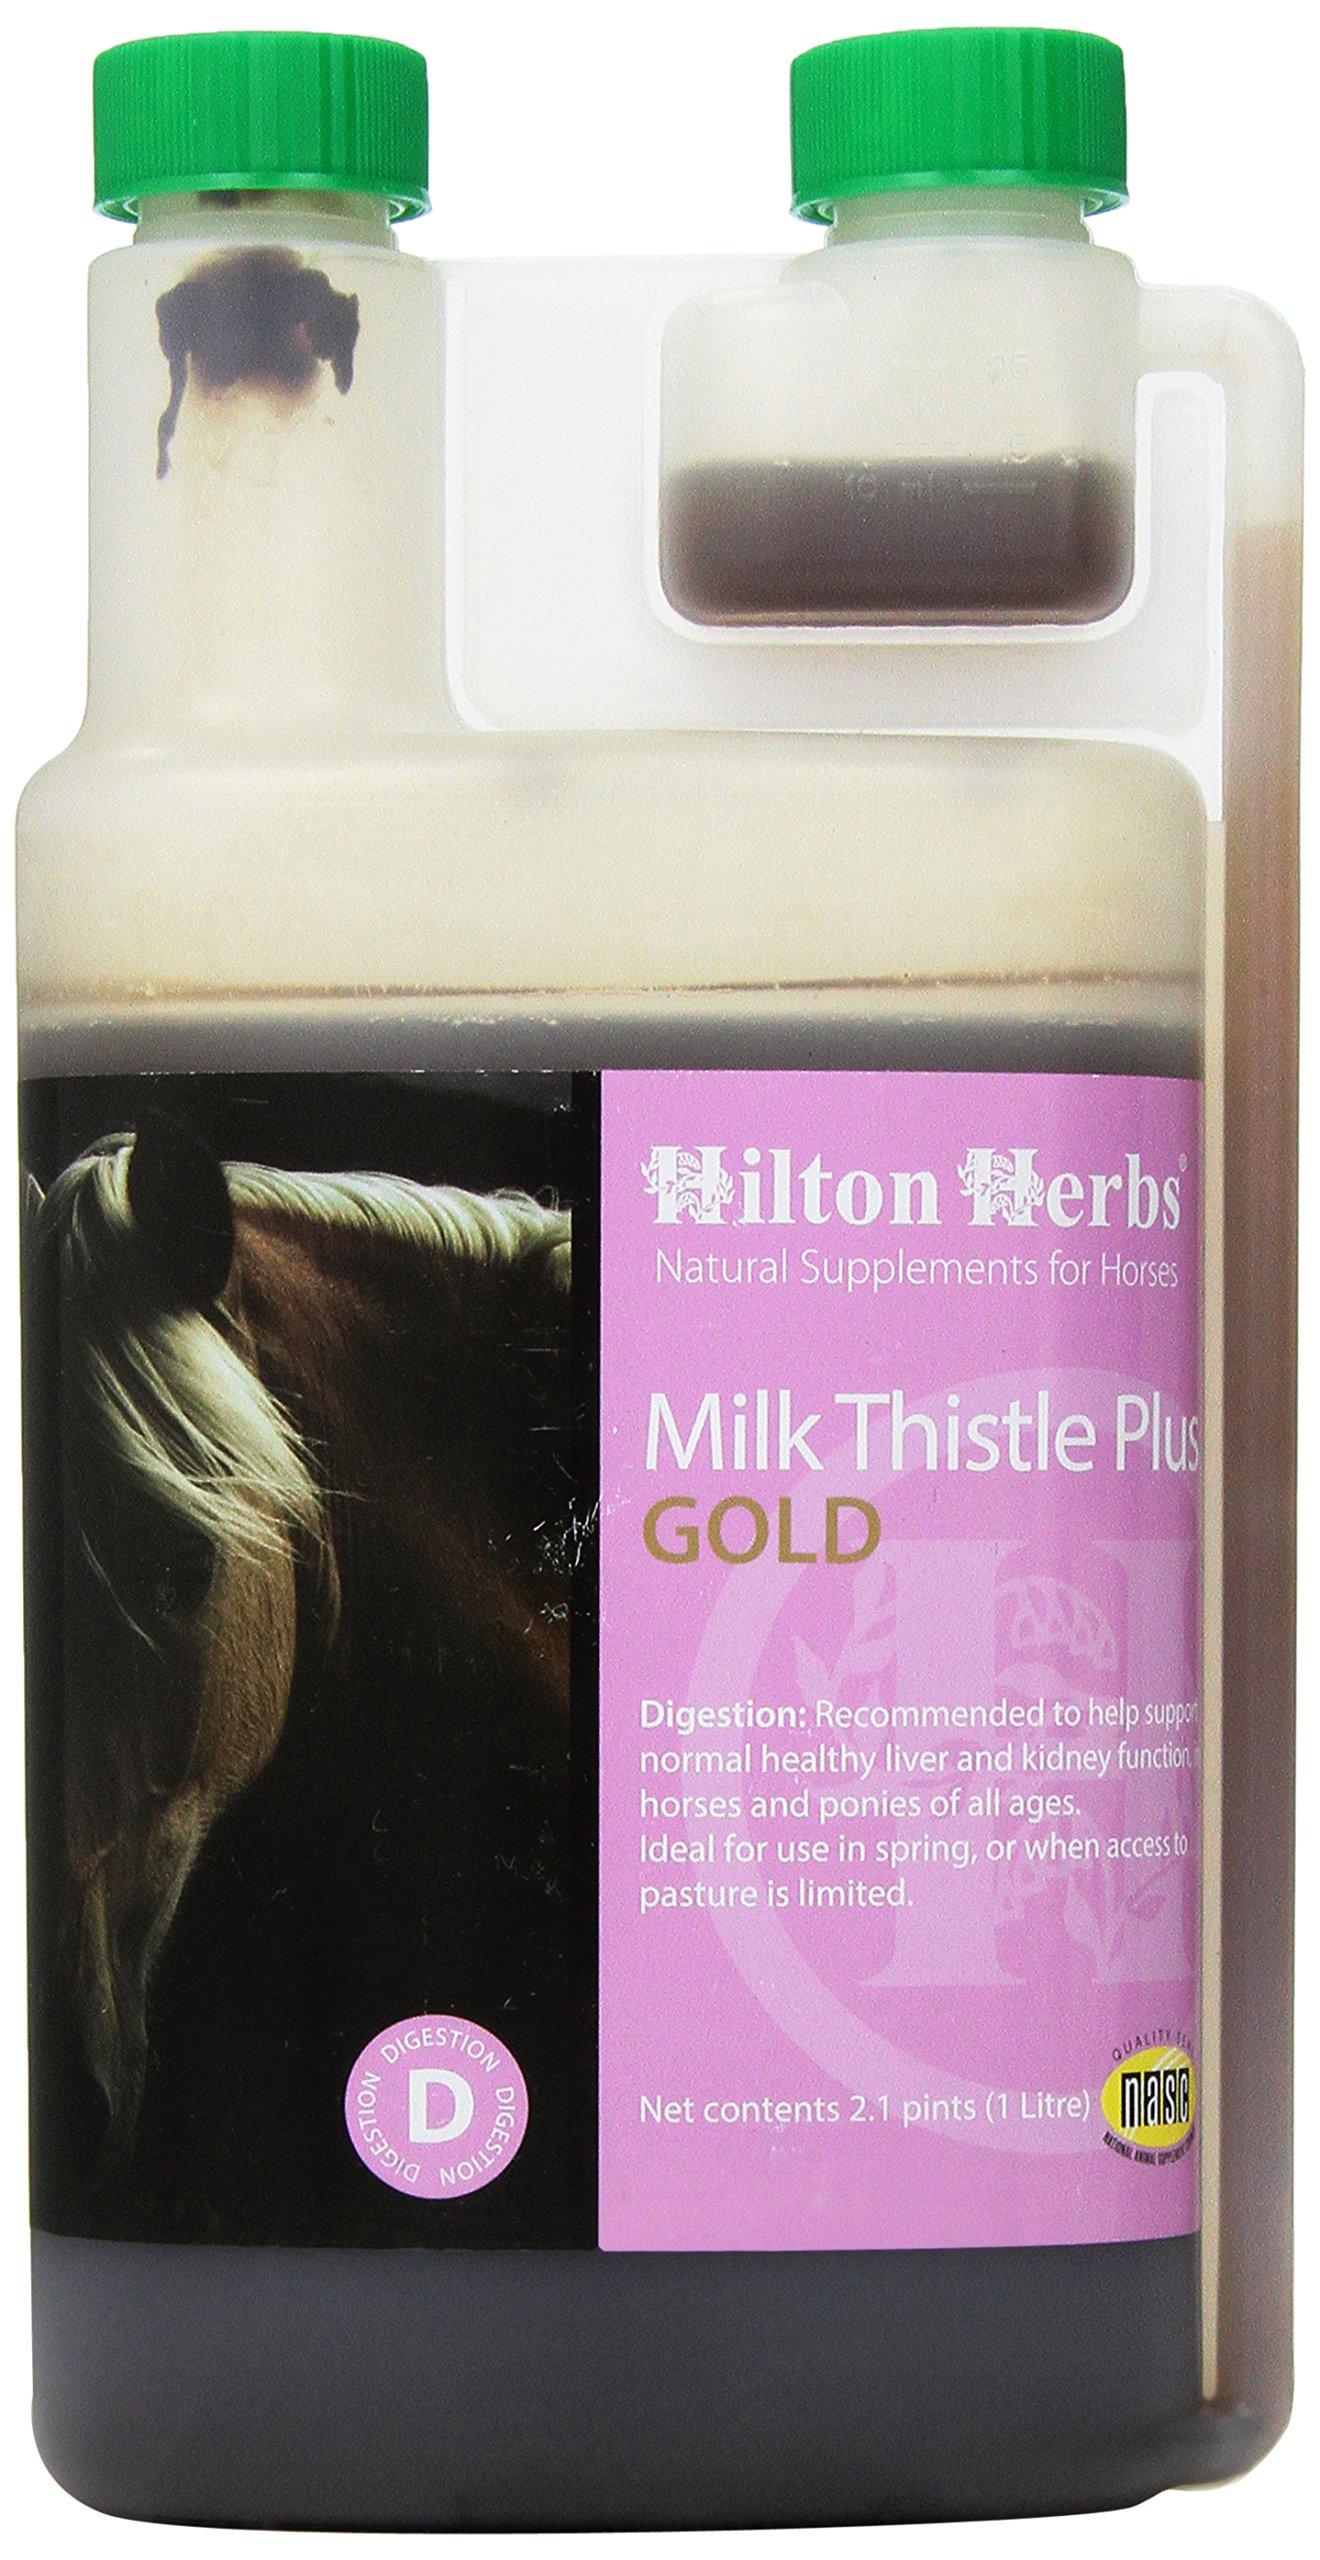 Hilton Herbs Milk Thistle Plus Gold Liquid Herbal Detox Supplement for Horses, 2.1pt Bottle by Hilton Herbs